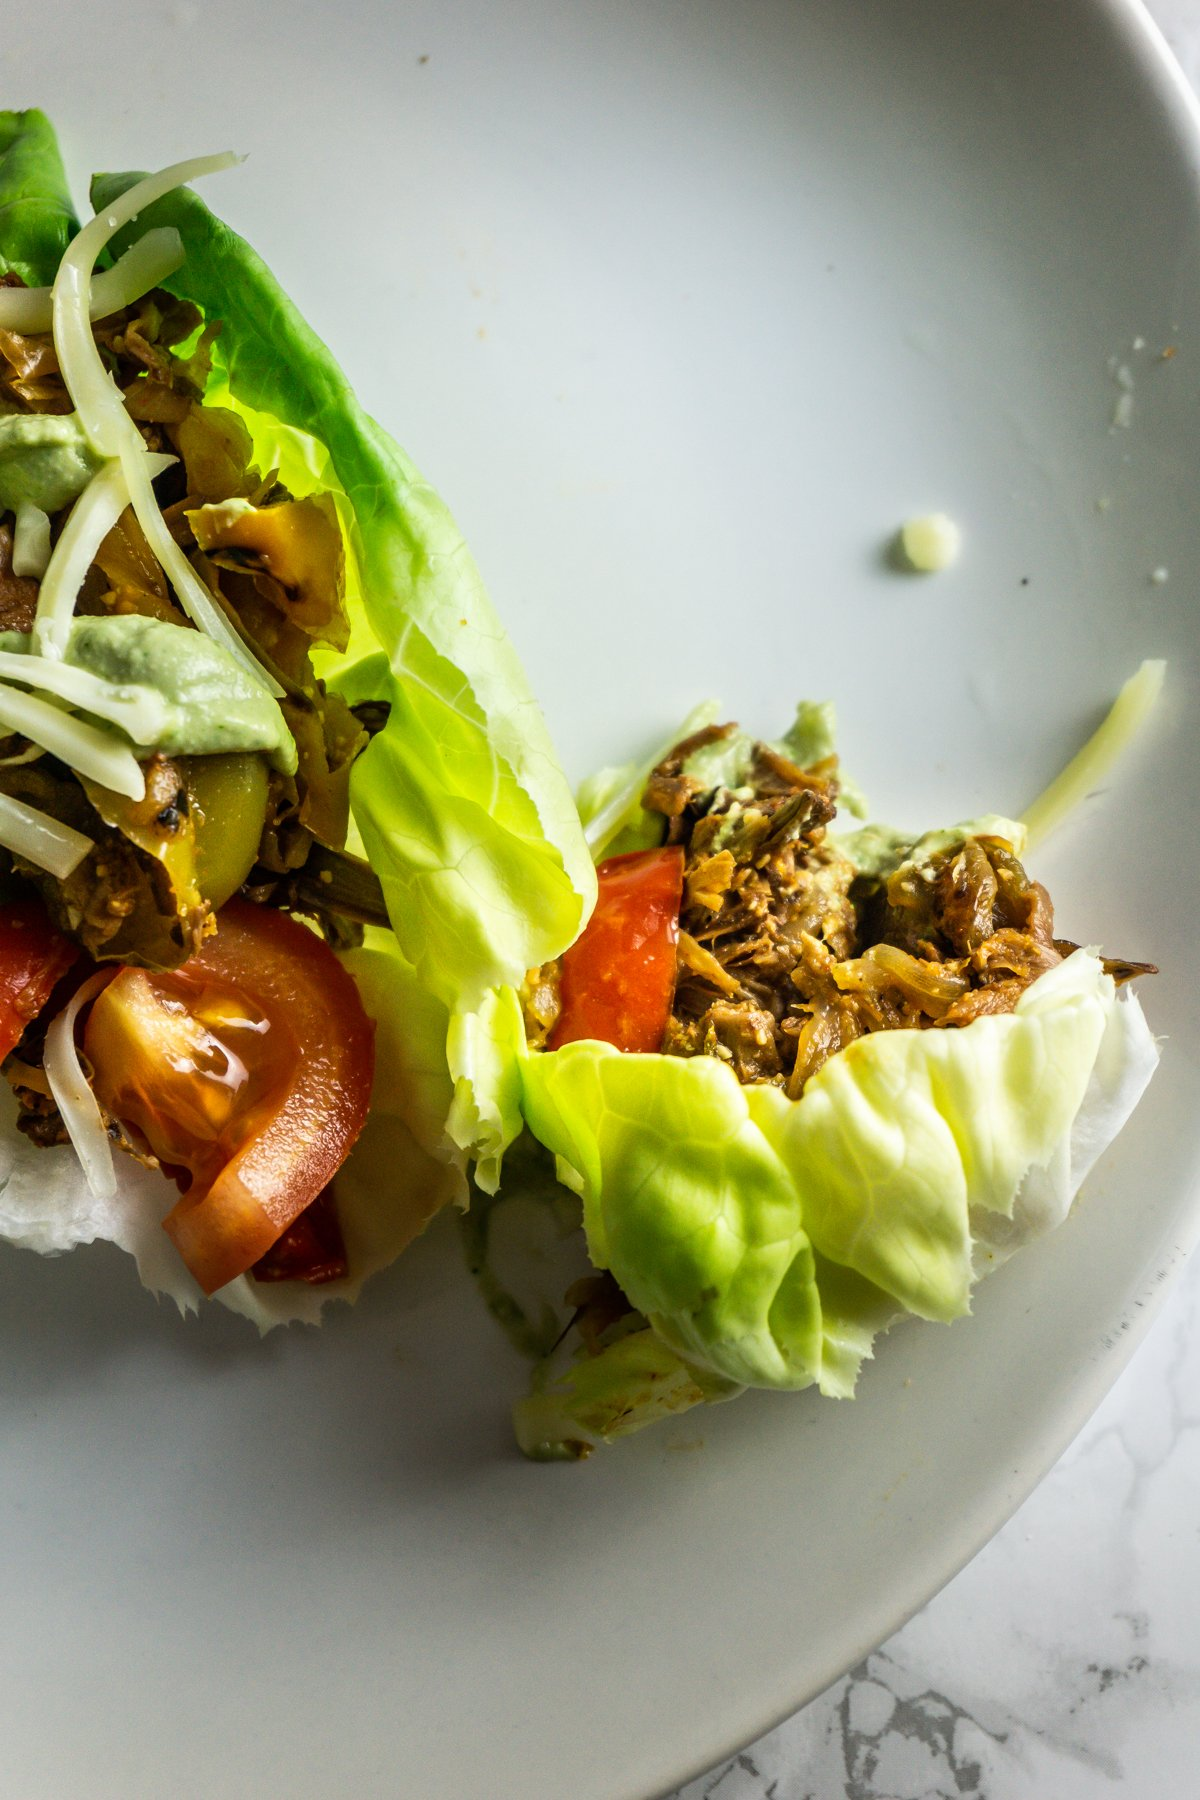 Mexican-Inspired Jackfruit Fajitas in lettuce wraps on a plate bit into